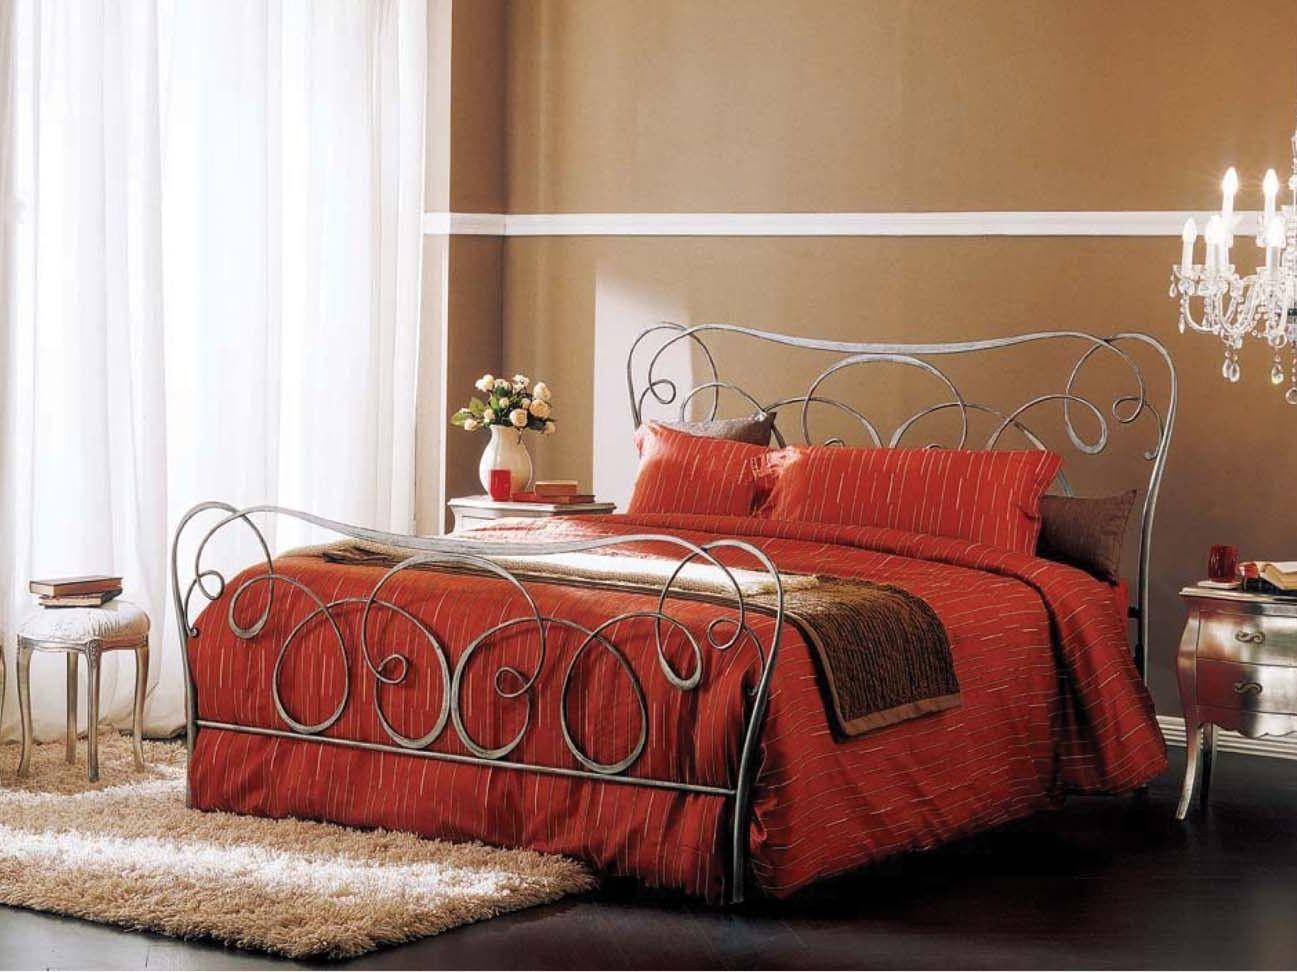 iron double bed altea by bontempi design studio carlesi design - Letto Foglia Argento Fantasy Bontempi